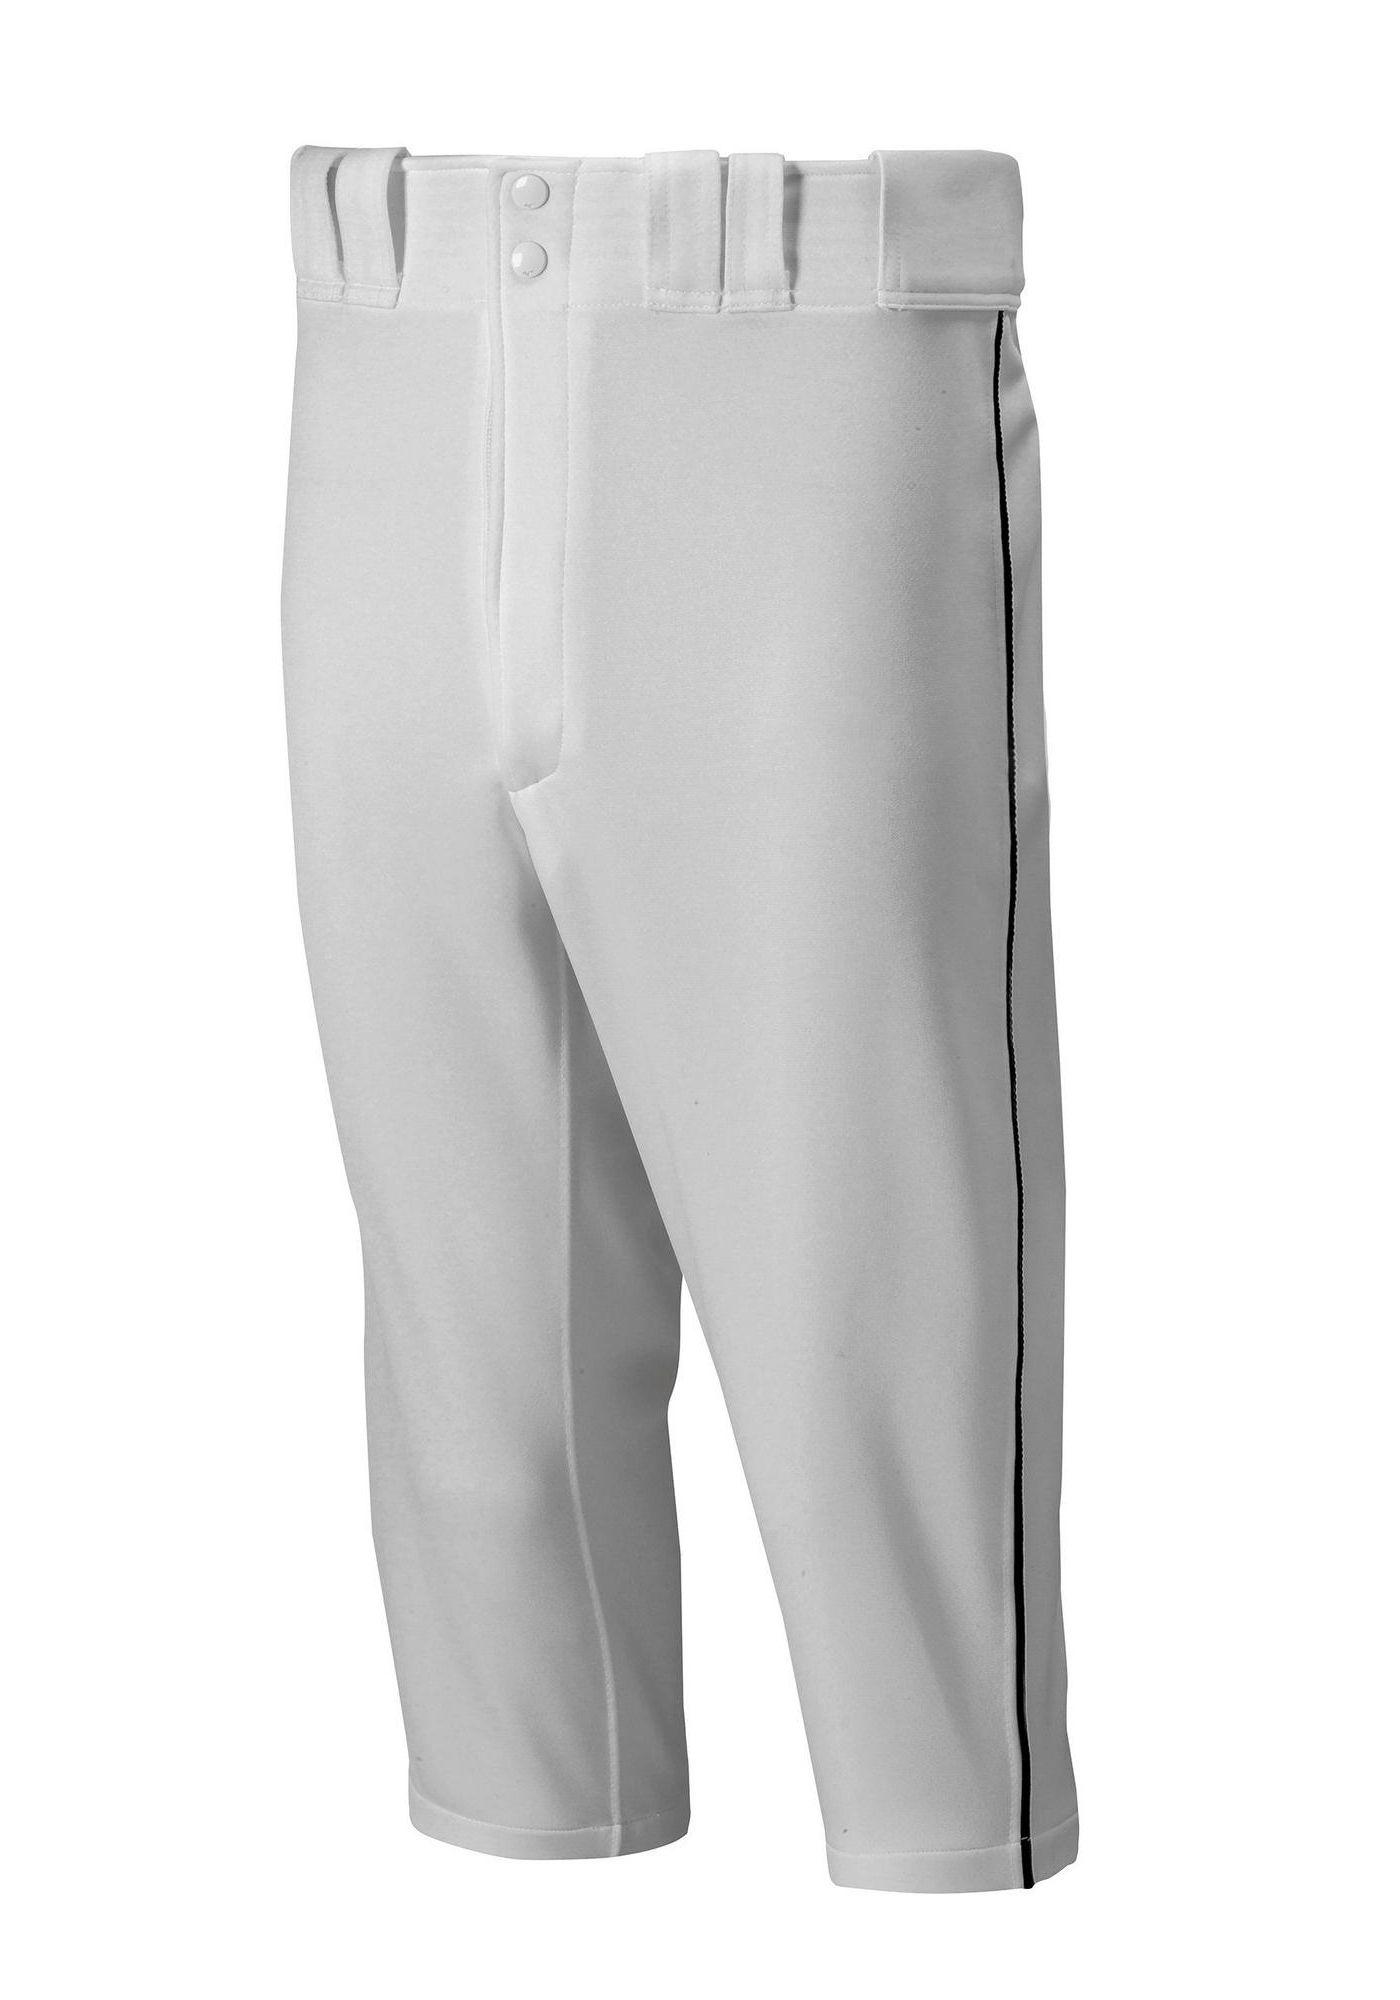 Mizuno Boys' Premier Short Piped Baseball Pants